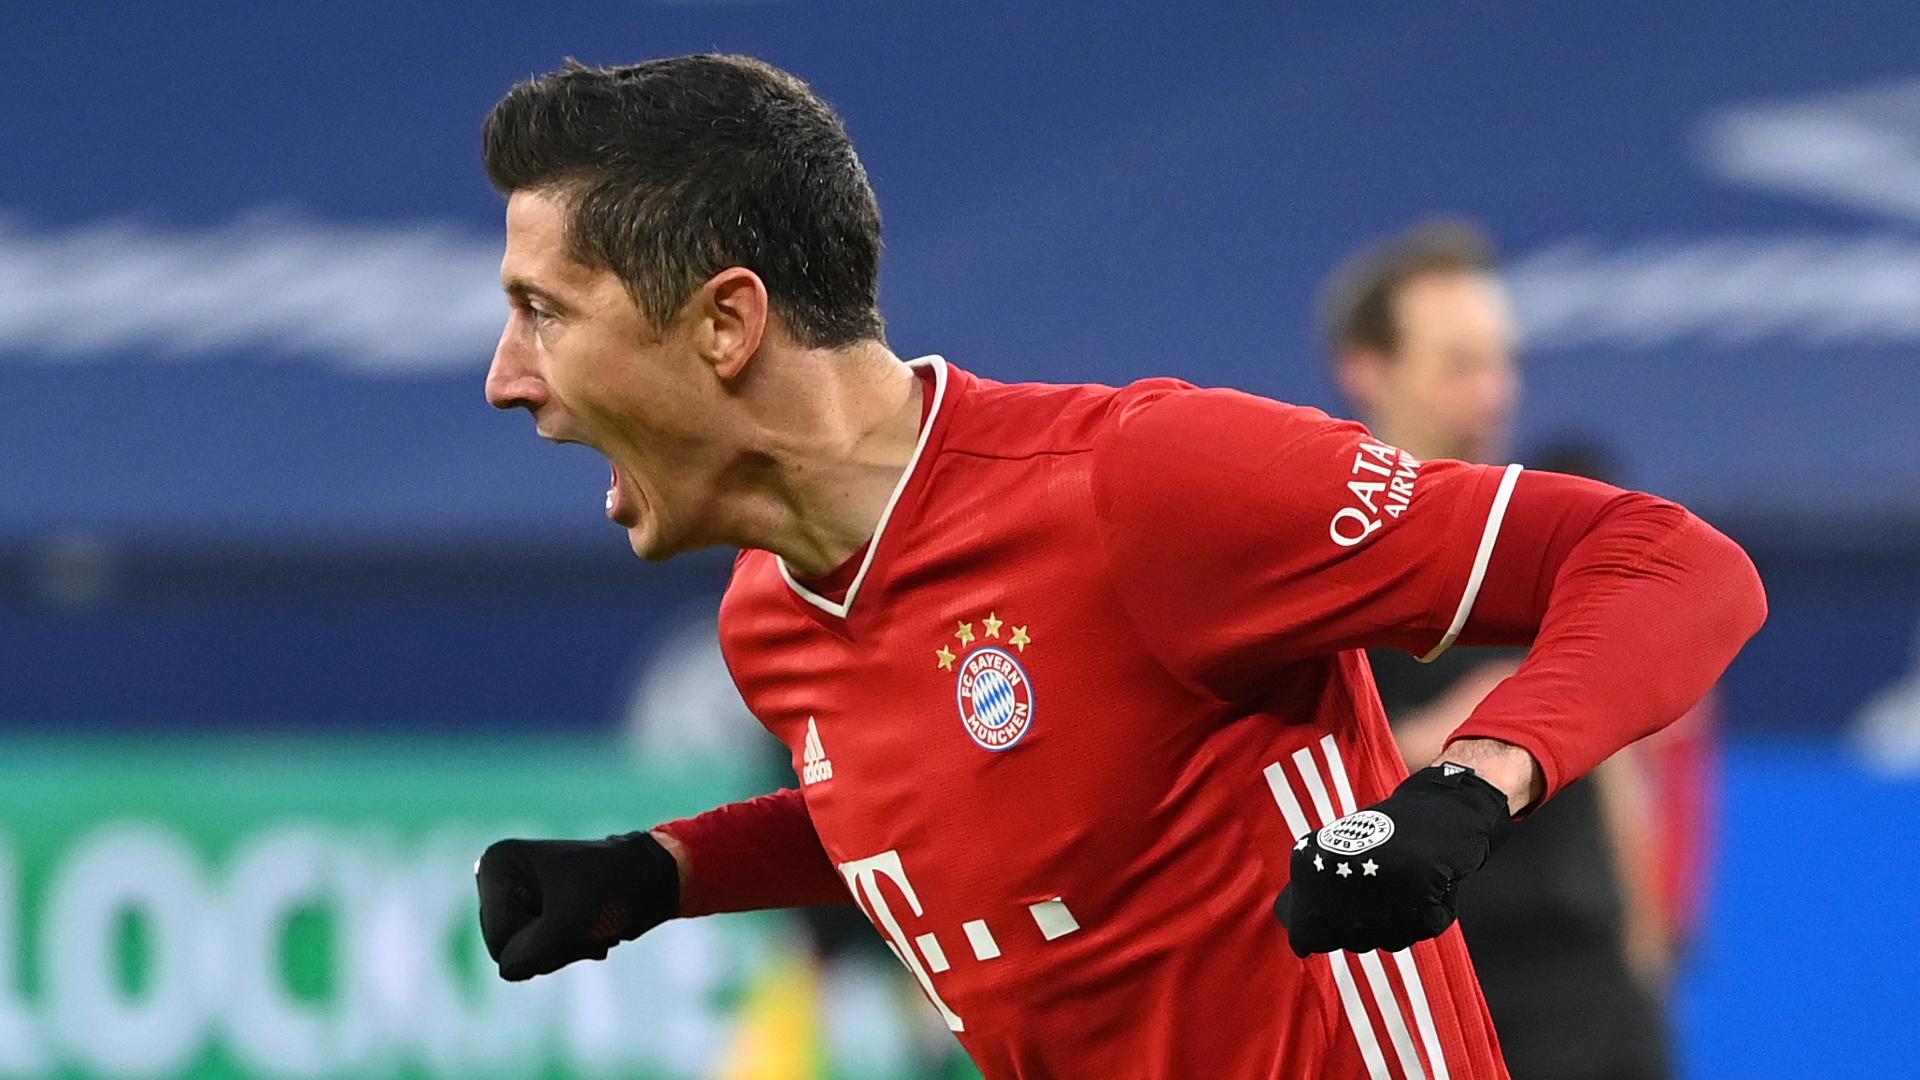 Schalke 0-4 Bayern Munich: Lewandowski makes more history as champions go seven points clear